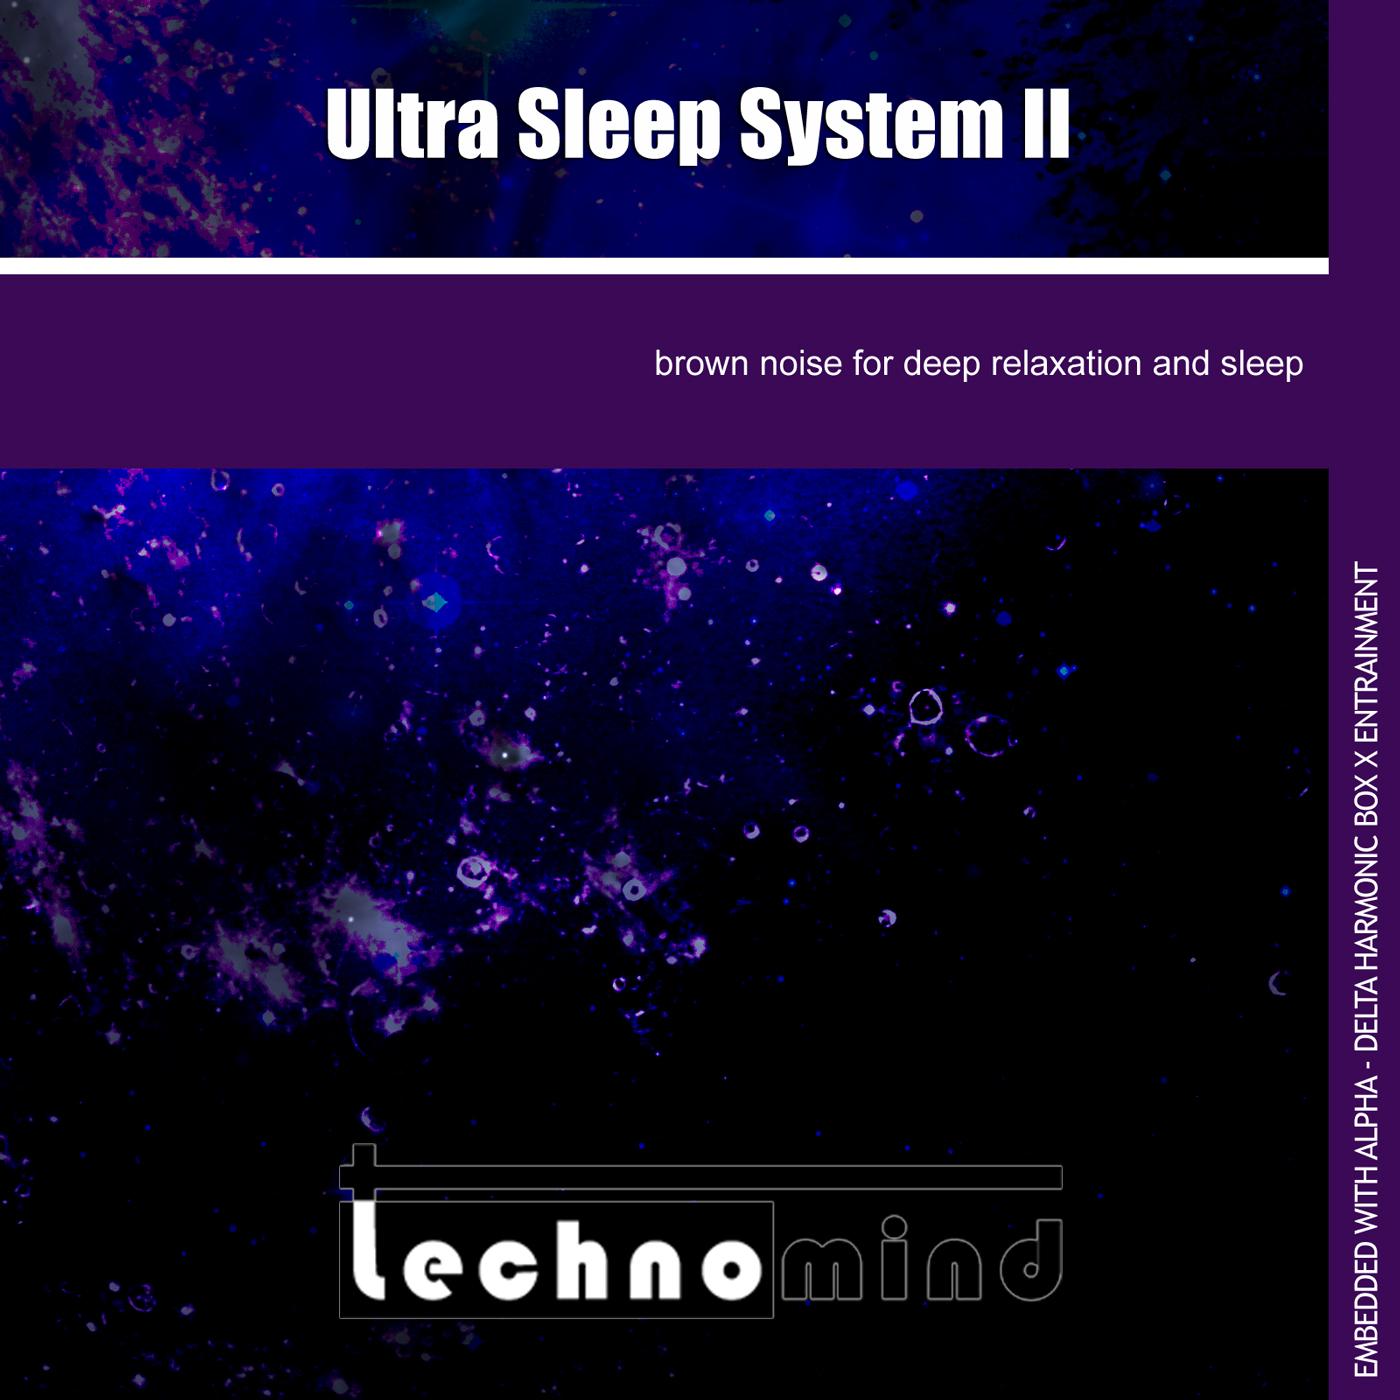 The Delta Sleep System